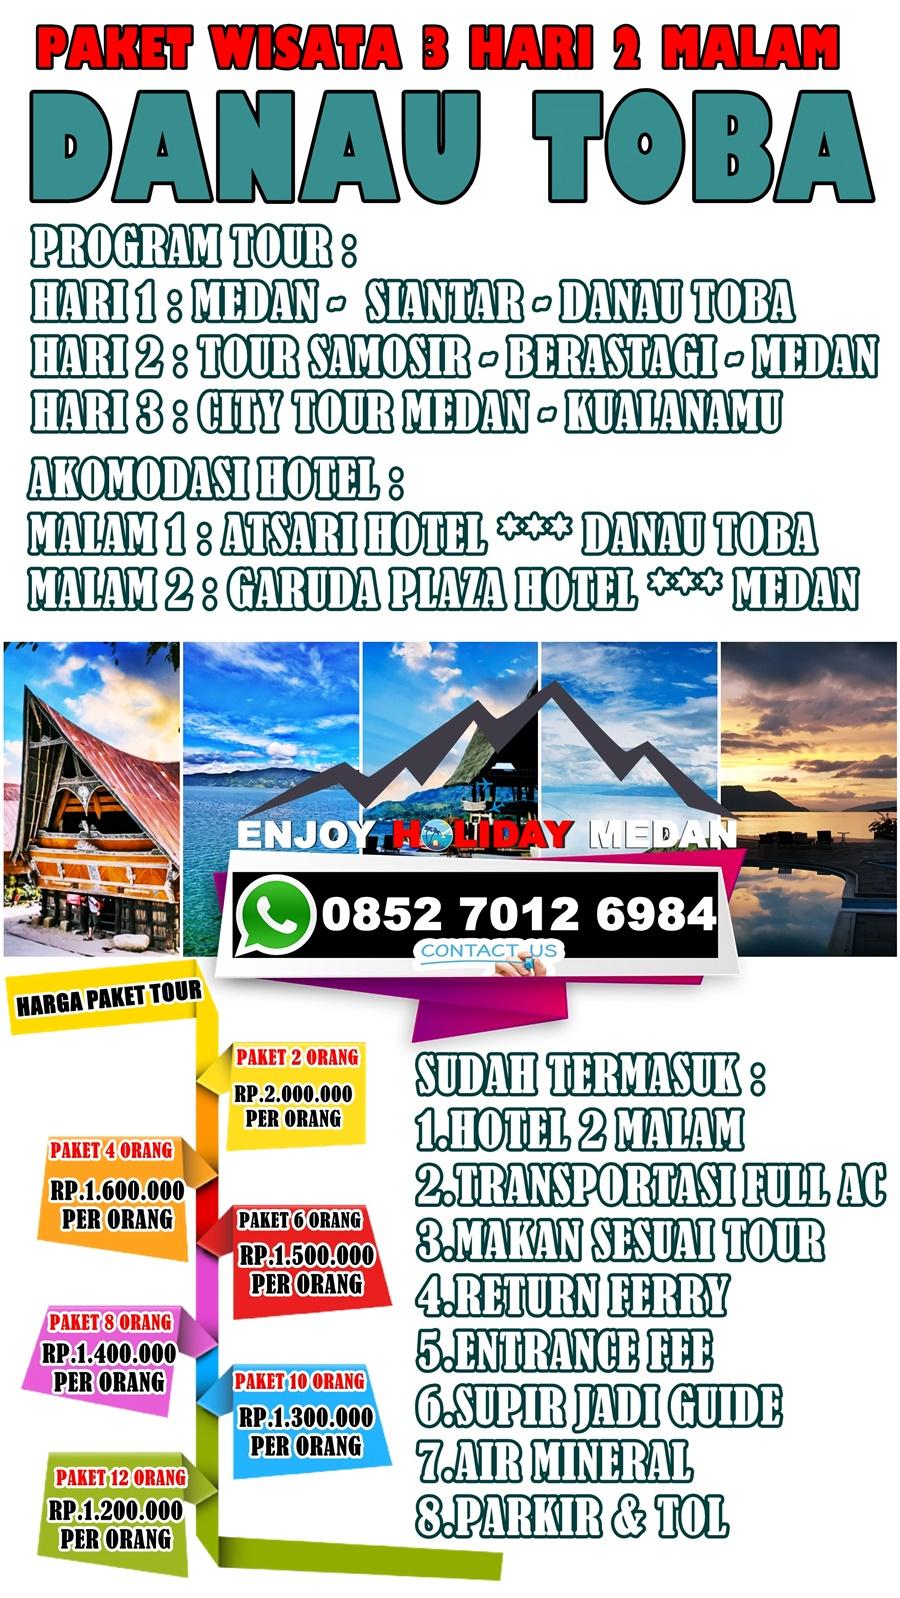 Promo Paket Wisata Danau Toba